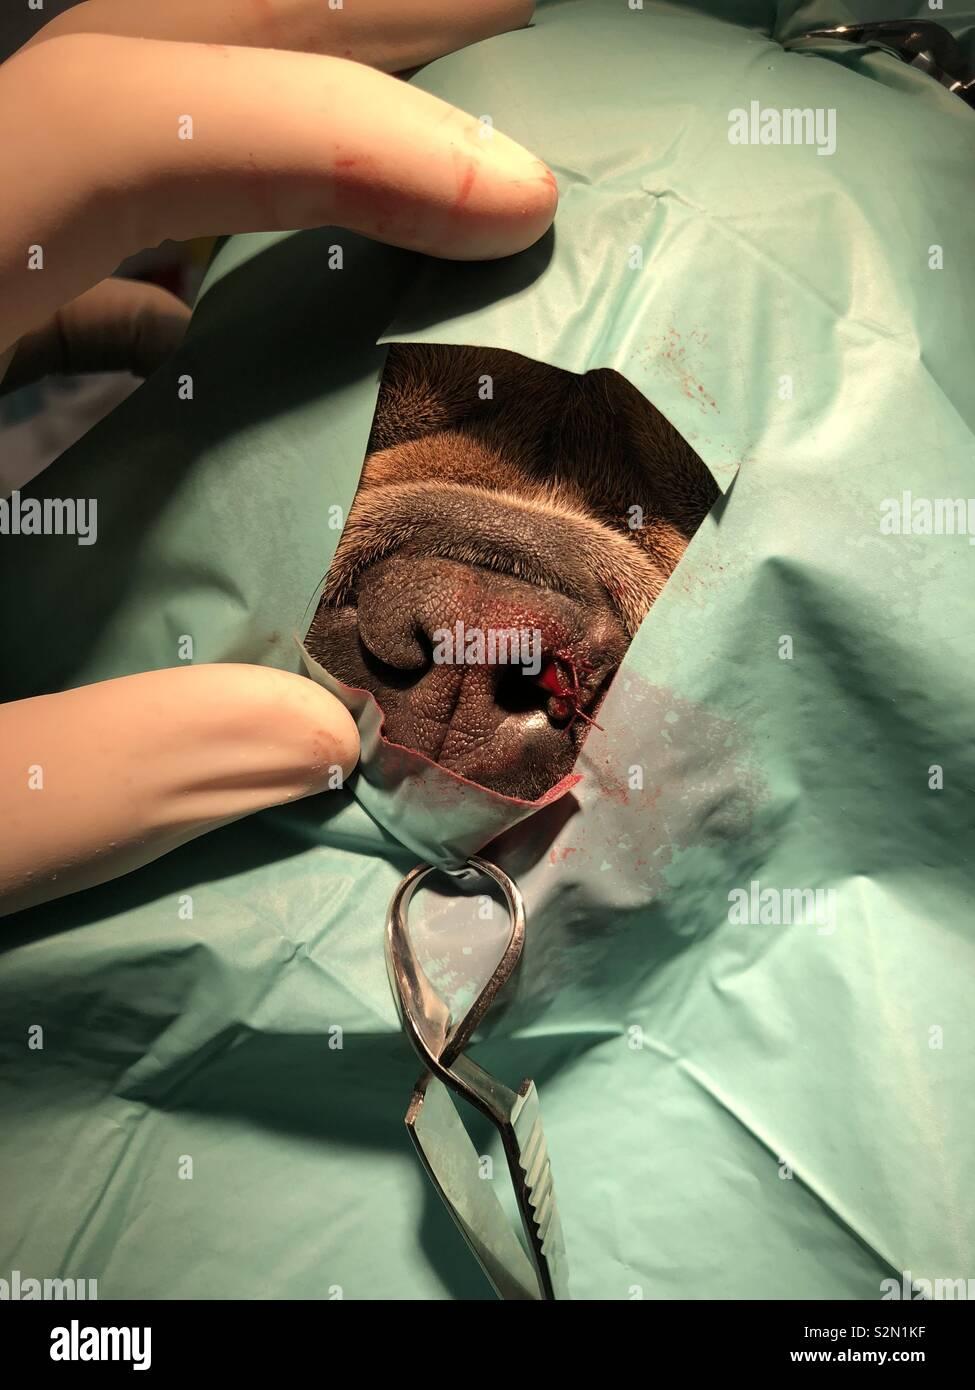 Canine nasal surgery - Stock Image